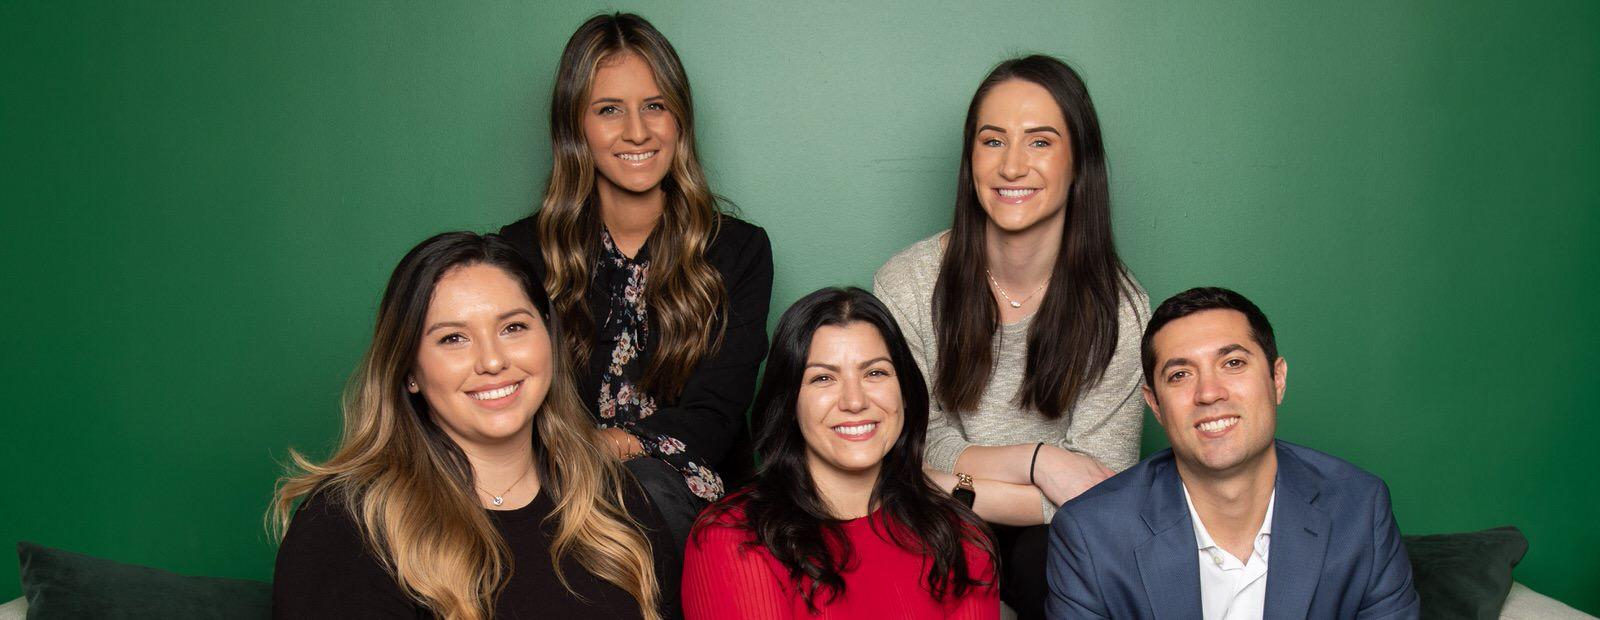 Presidio team photo